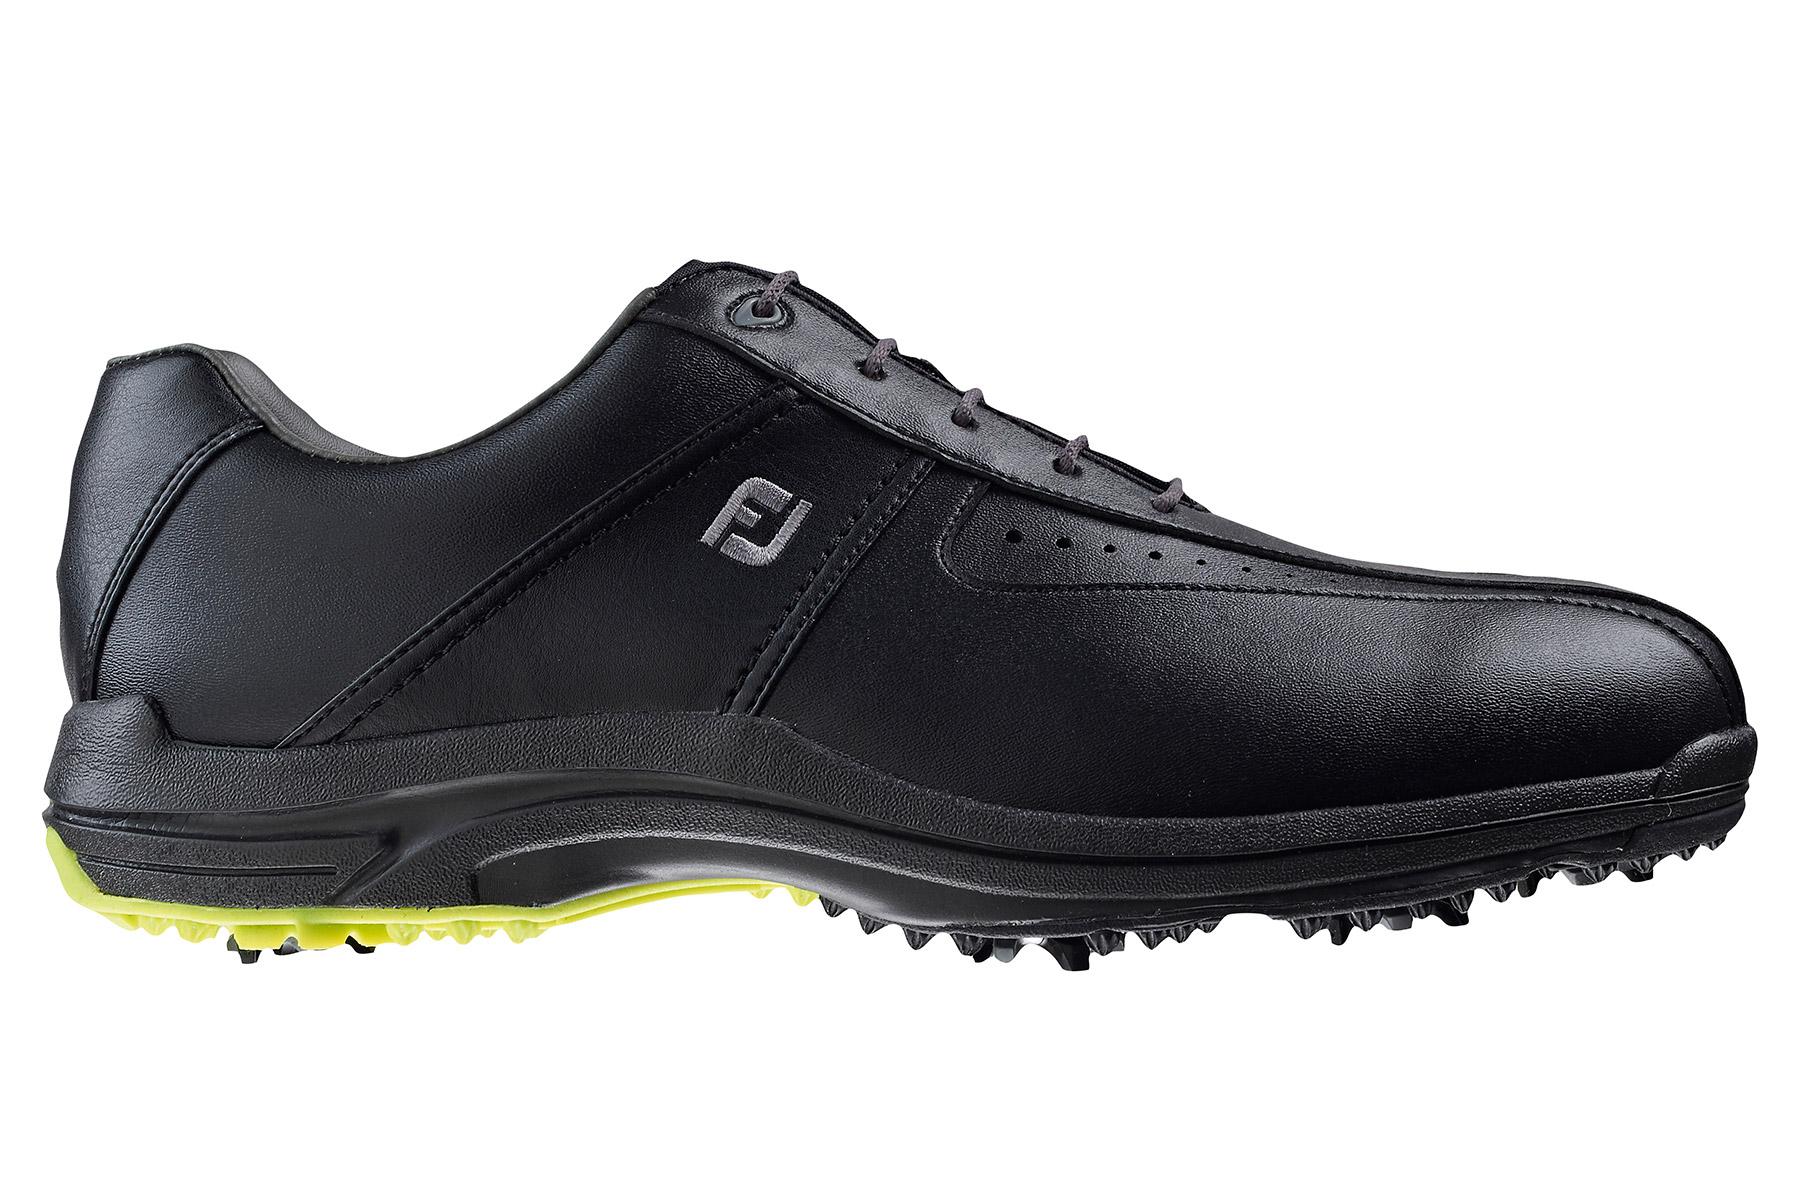 Footjoy Golf Shoes Sale Uk